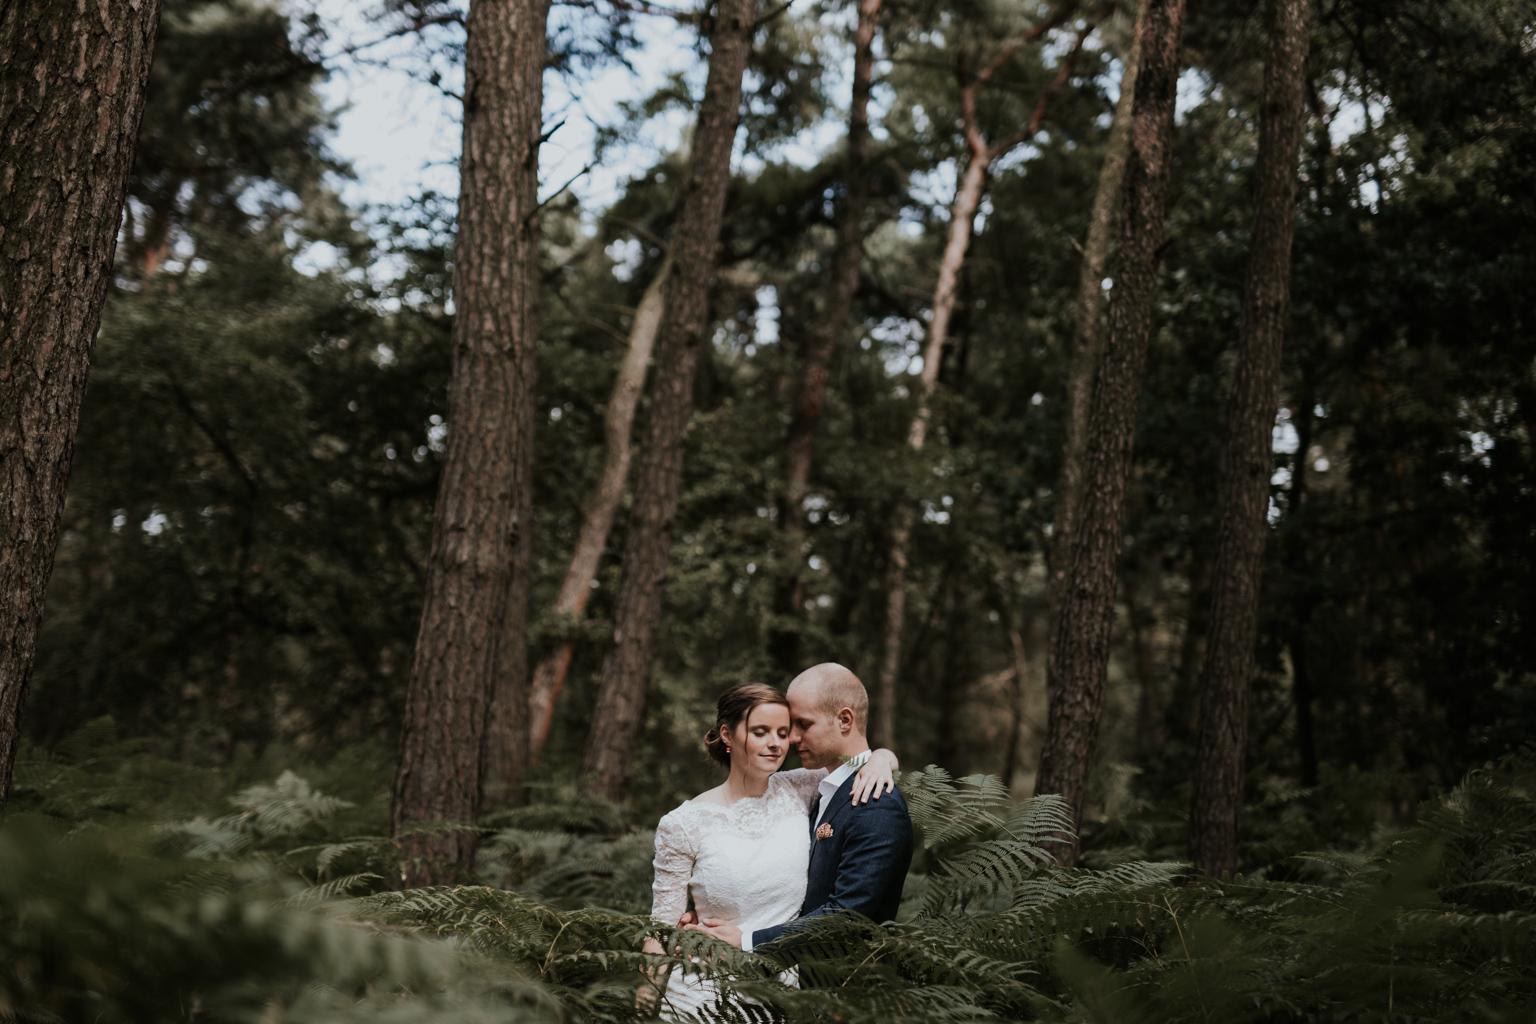 Huwelijksfotografie_kalmthout-111.jpg